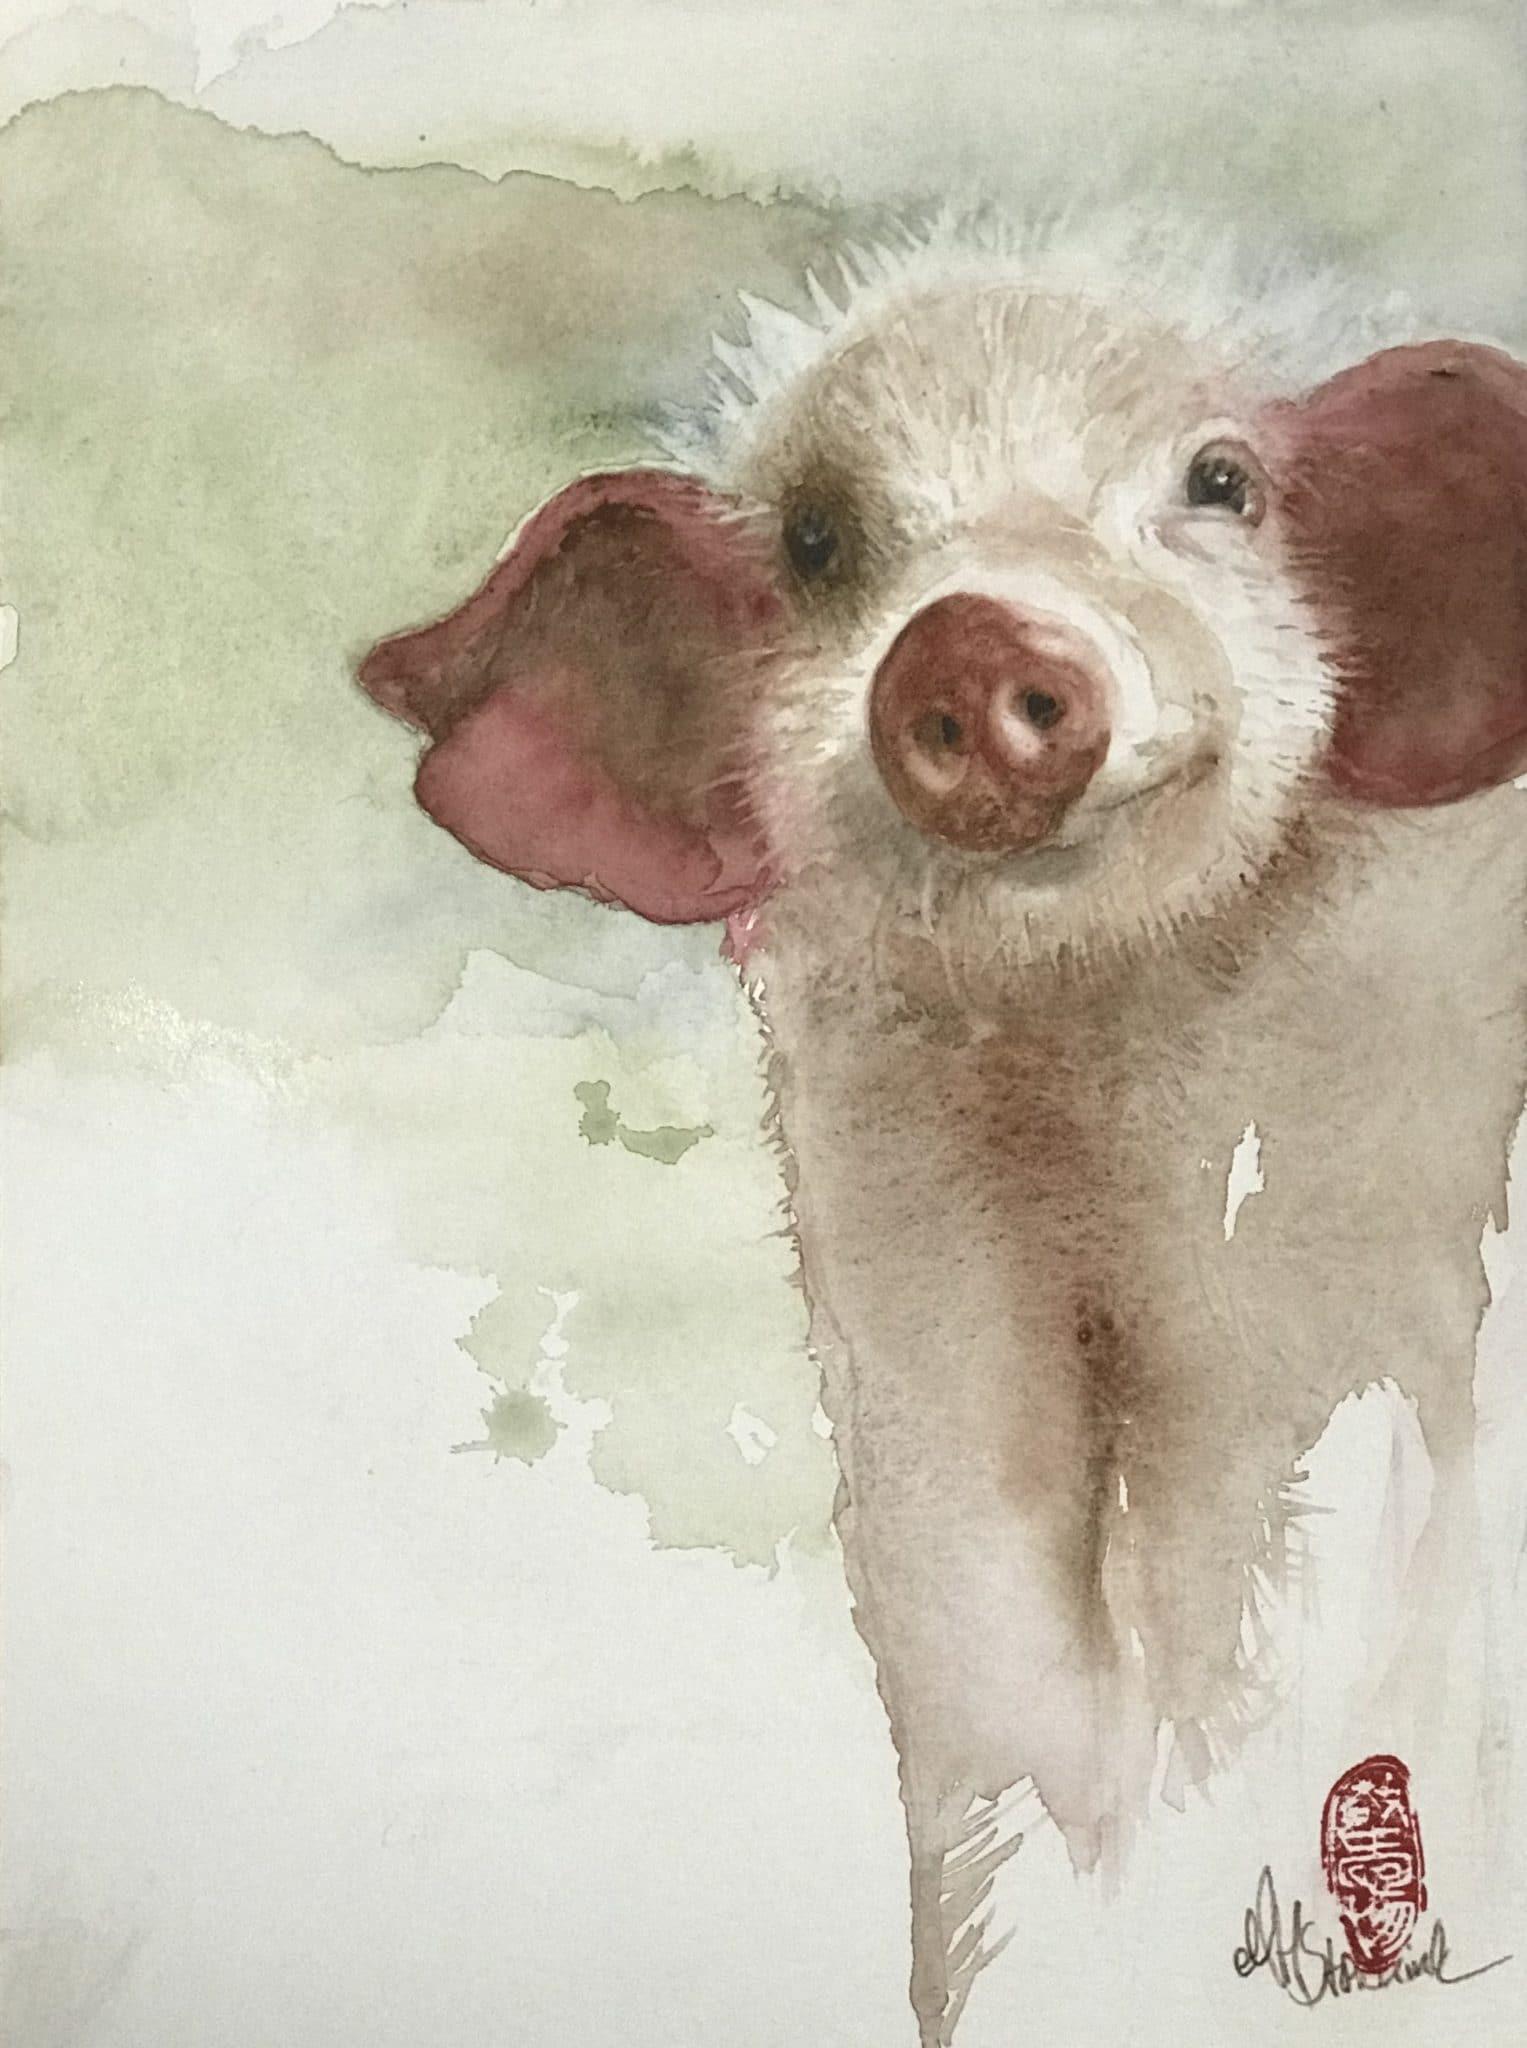 Curious Little Piggy - 30x40cm